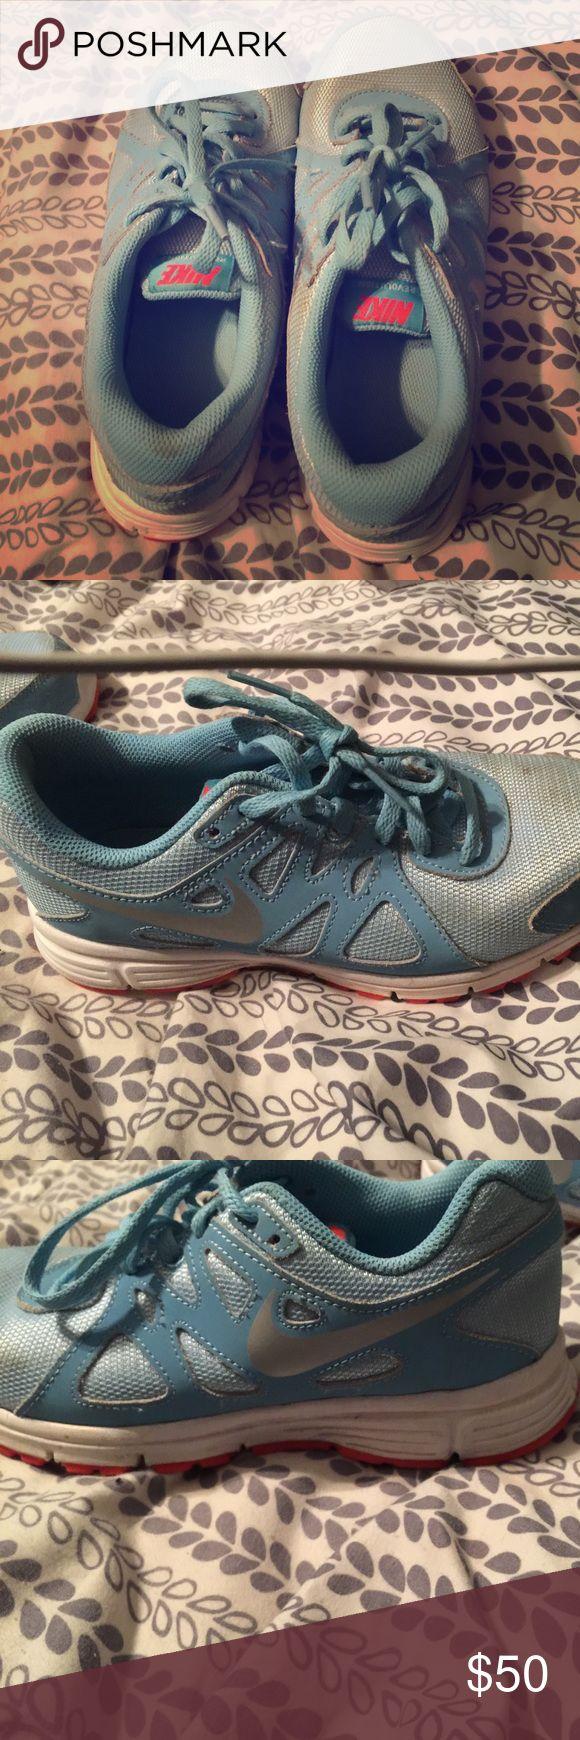 Baby Blue Nike Shoes Size 5 Baby Blue And Orange Nike Tennis Shoes Nike Shoes Athletic Shoes